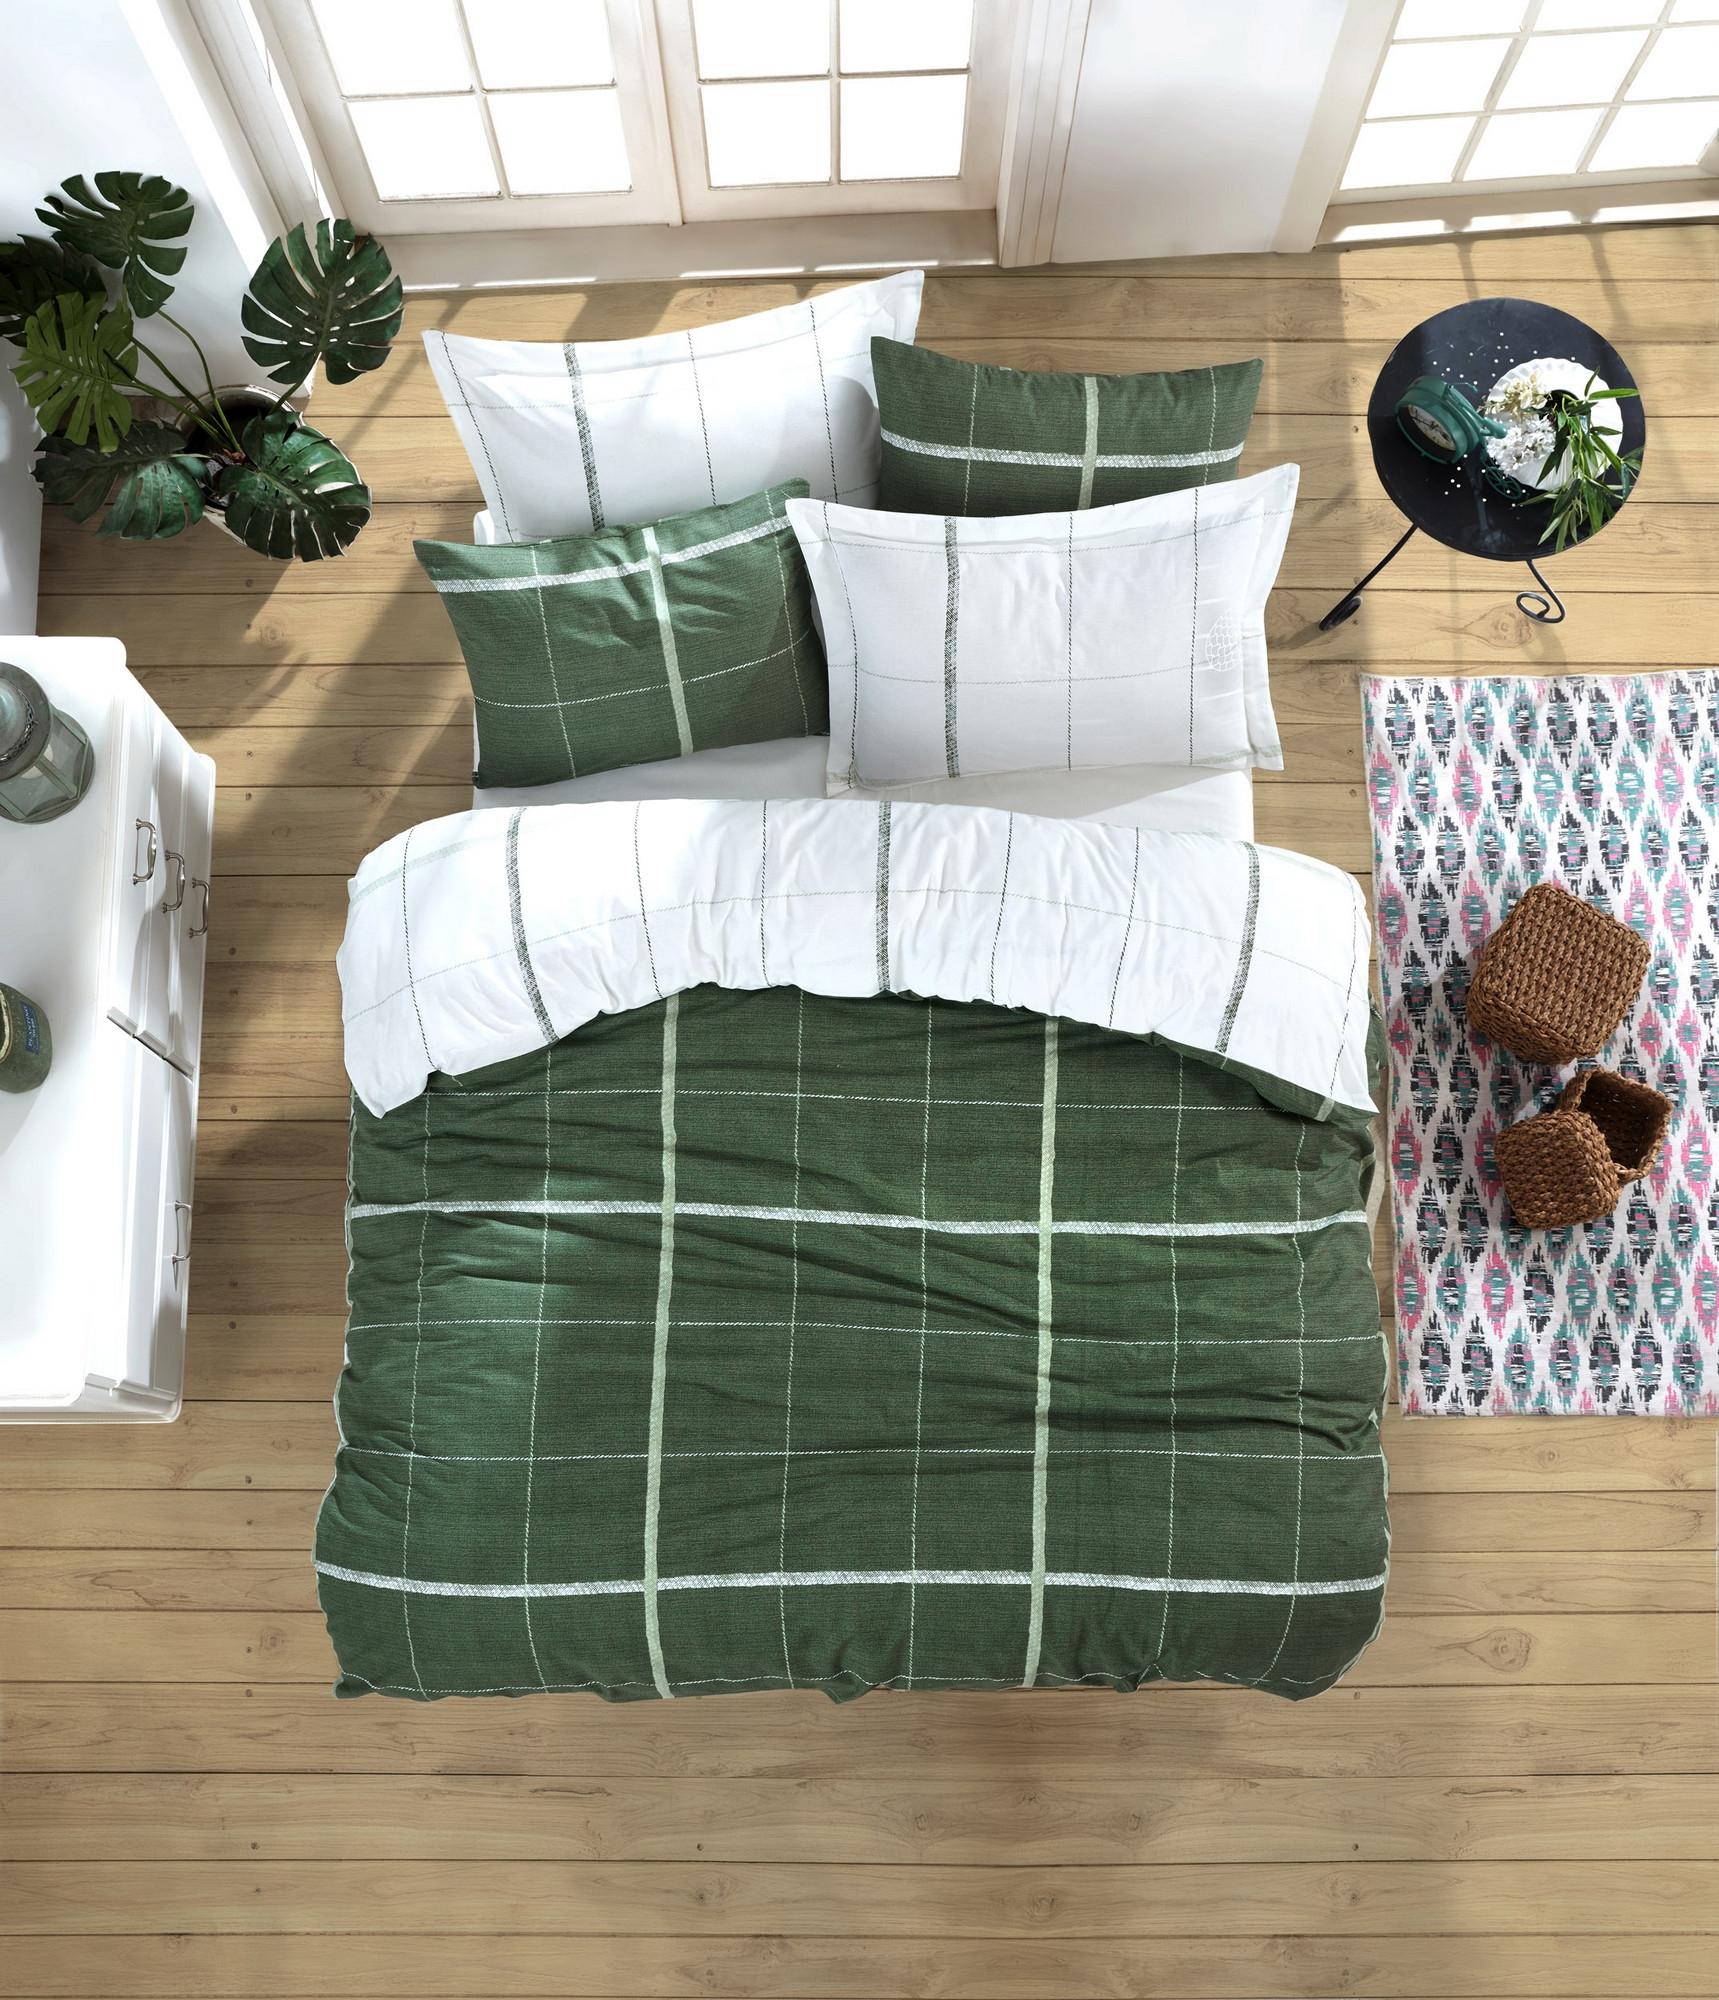 Lenjerie de pat din bumbac Ranforce Maya Verde / Alb, 200 x 220 cm somproduct.ro